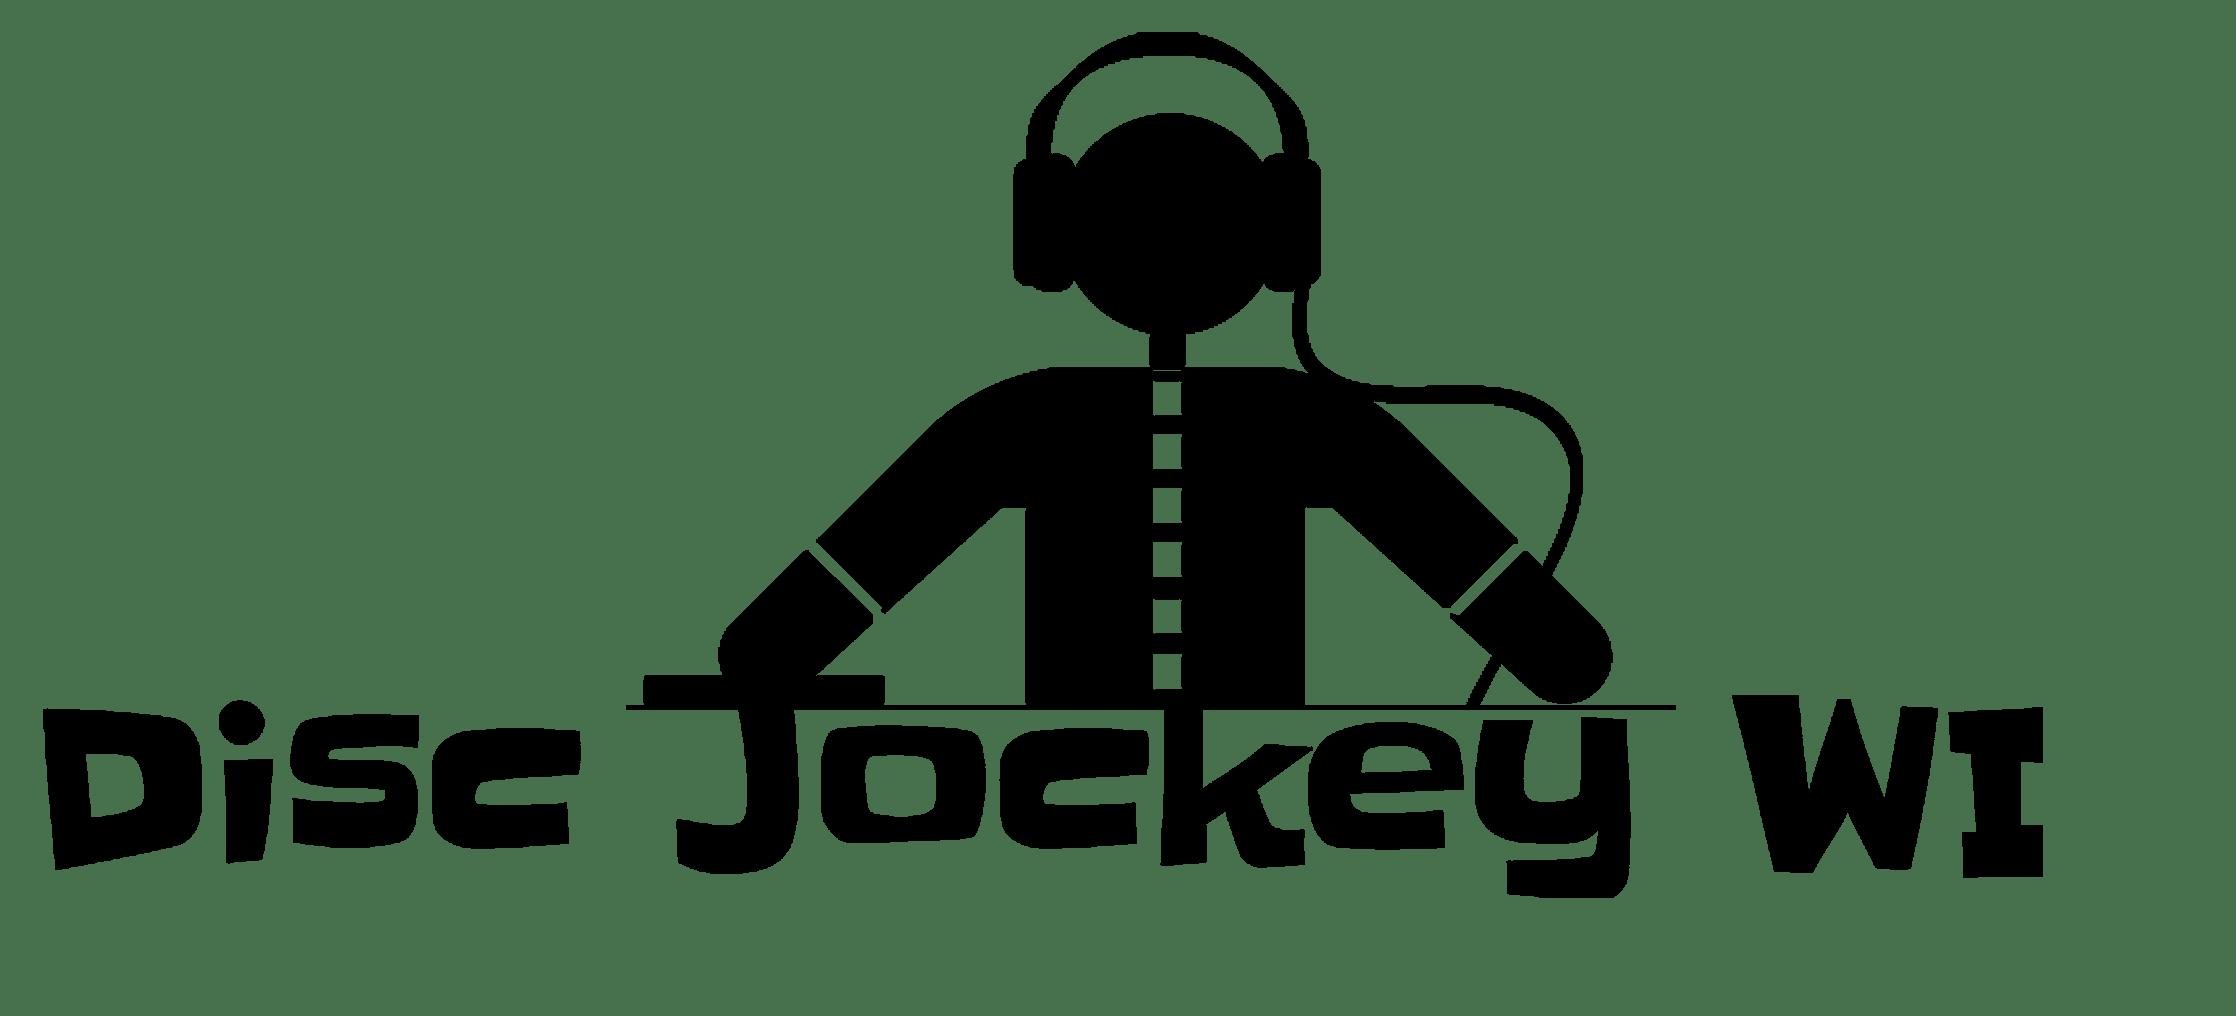 Wisconsin Dj And Disc Jockey Milwaukee Racine Kenosha